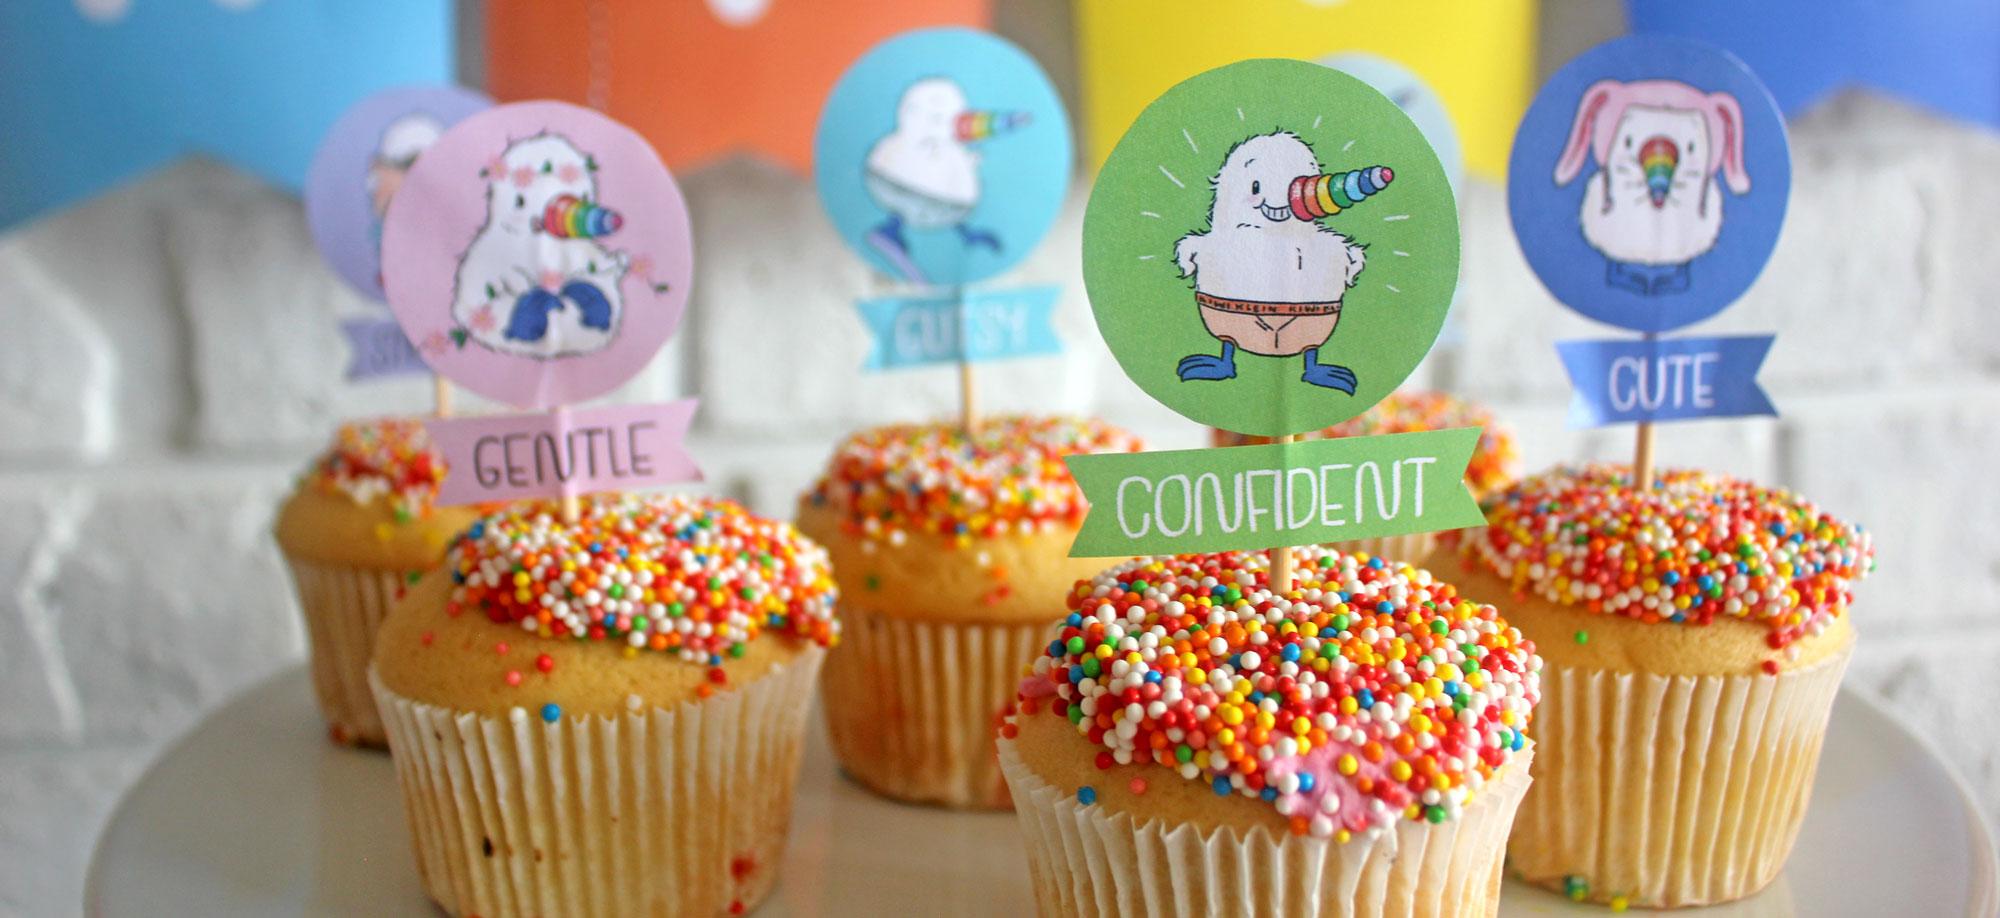 Kiwicorn Cupcake Toppers   Make your cupcakes super with these Kiwicorn Cupcake Toppers   Download